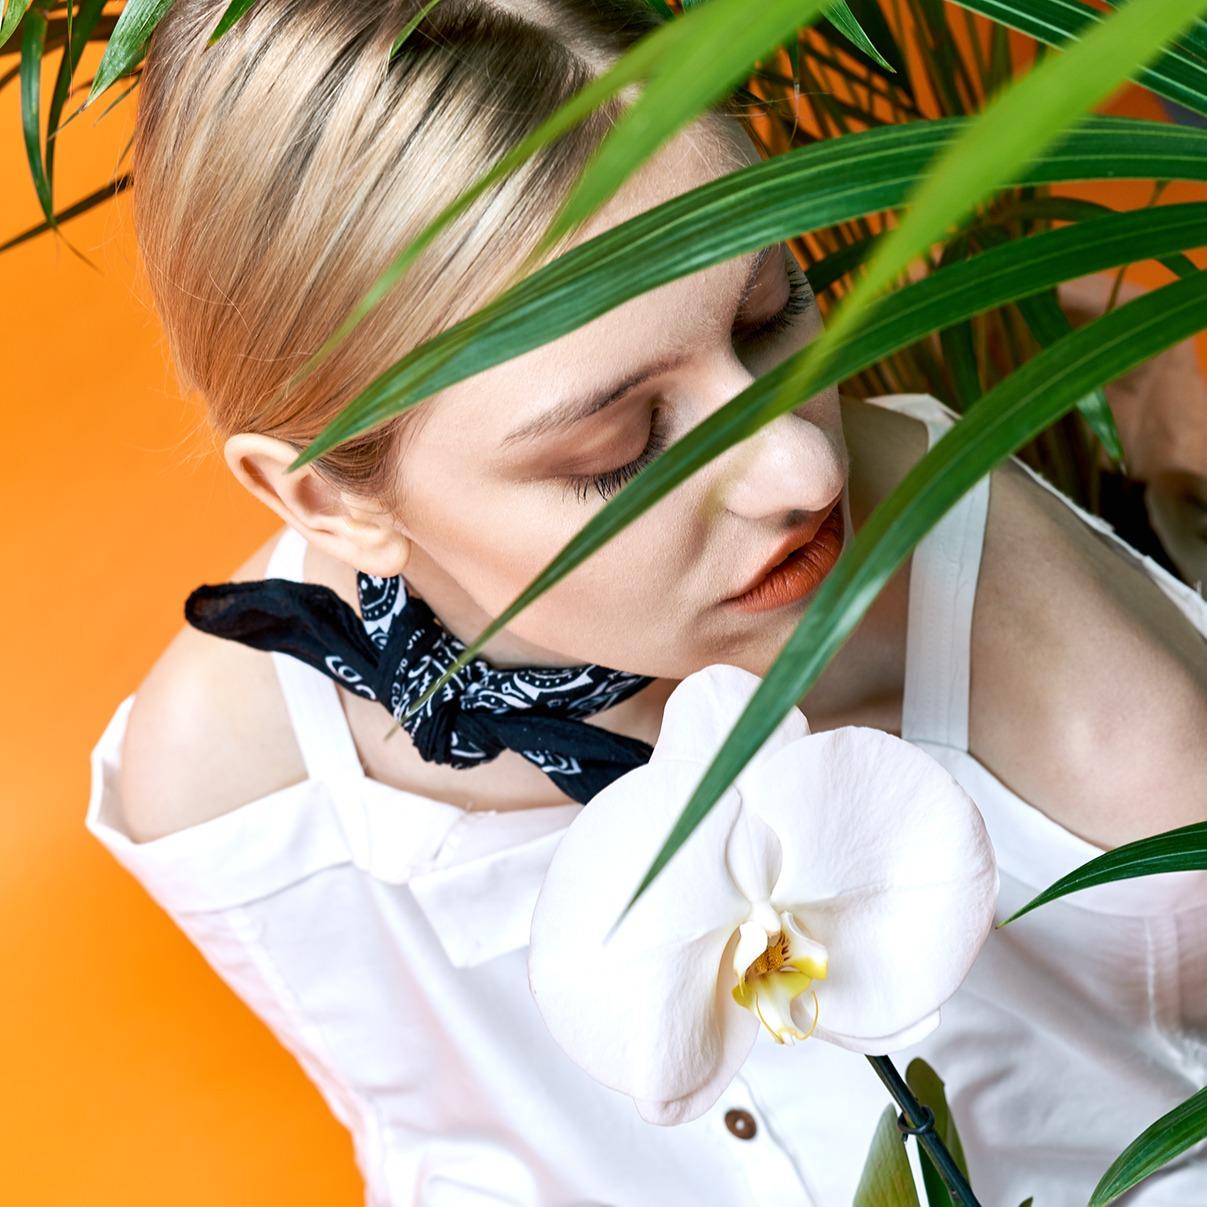 Modefotografie straubmuellerstudios Stuttgart frau blätter